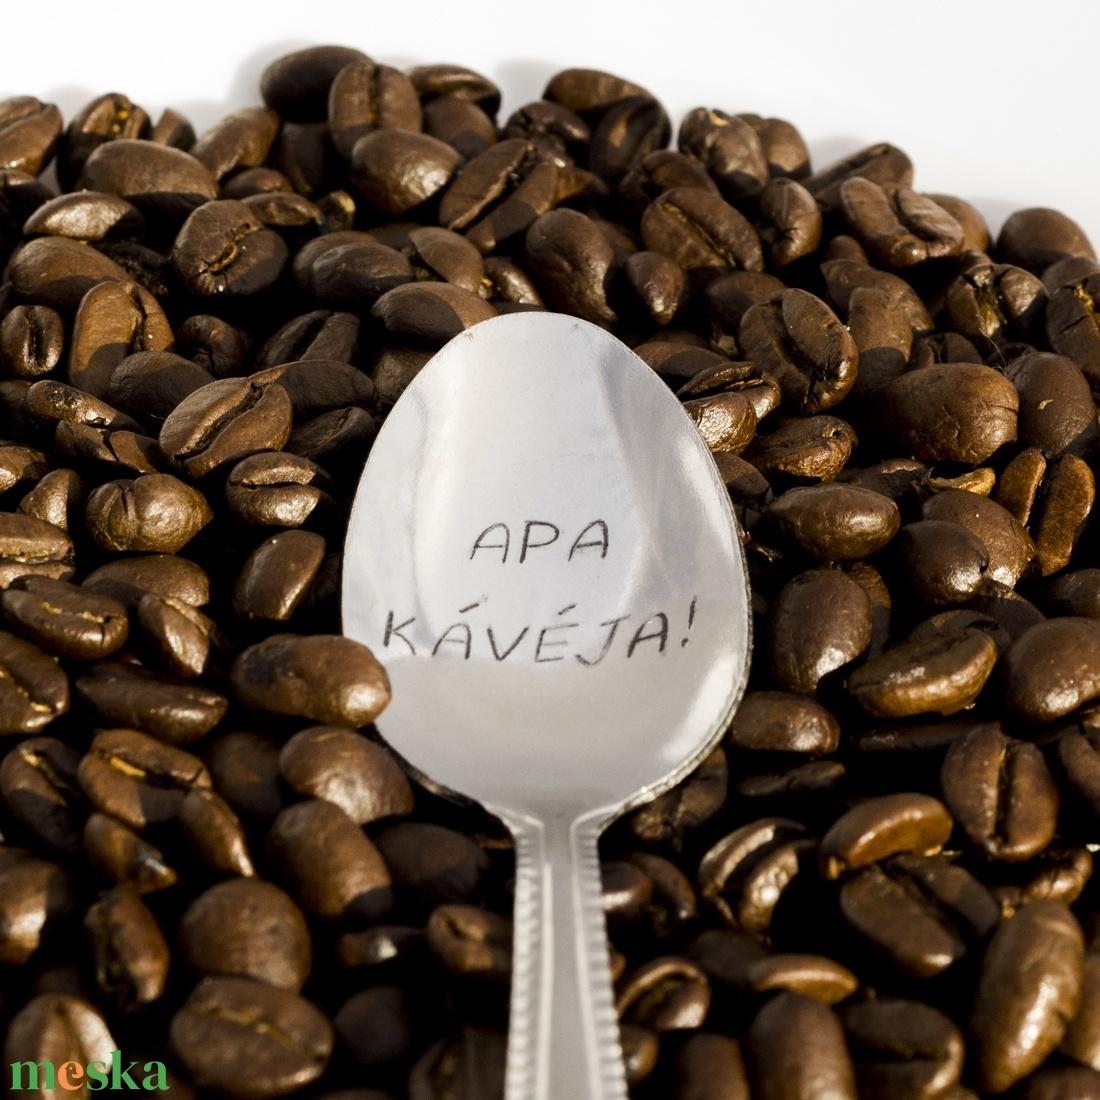 Apa kávéja! kiskanál (Revans) - Meska.hu